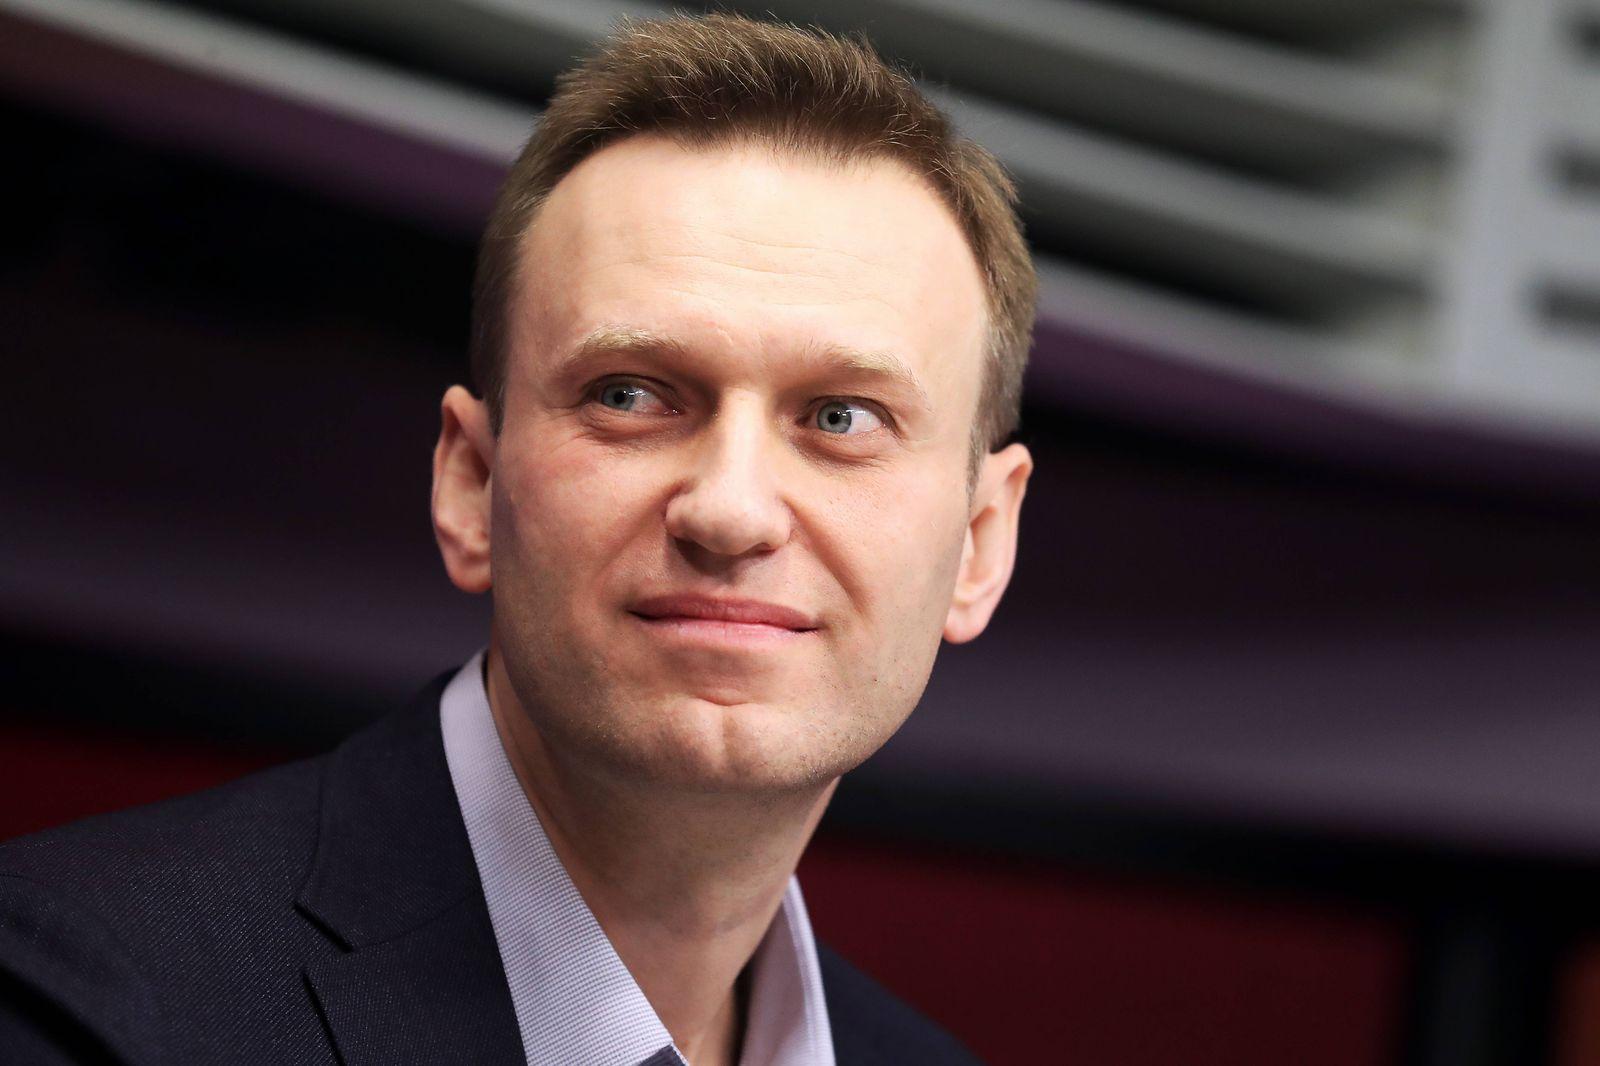 MOSCOW, RUSSIA MARCH 14, 2018: Russian opposition figure Alexei Navalny speaks live on Ekho Moskvy Radio. Anton Novod